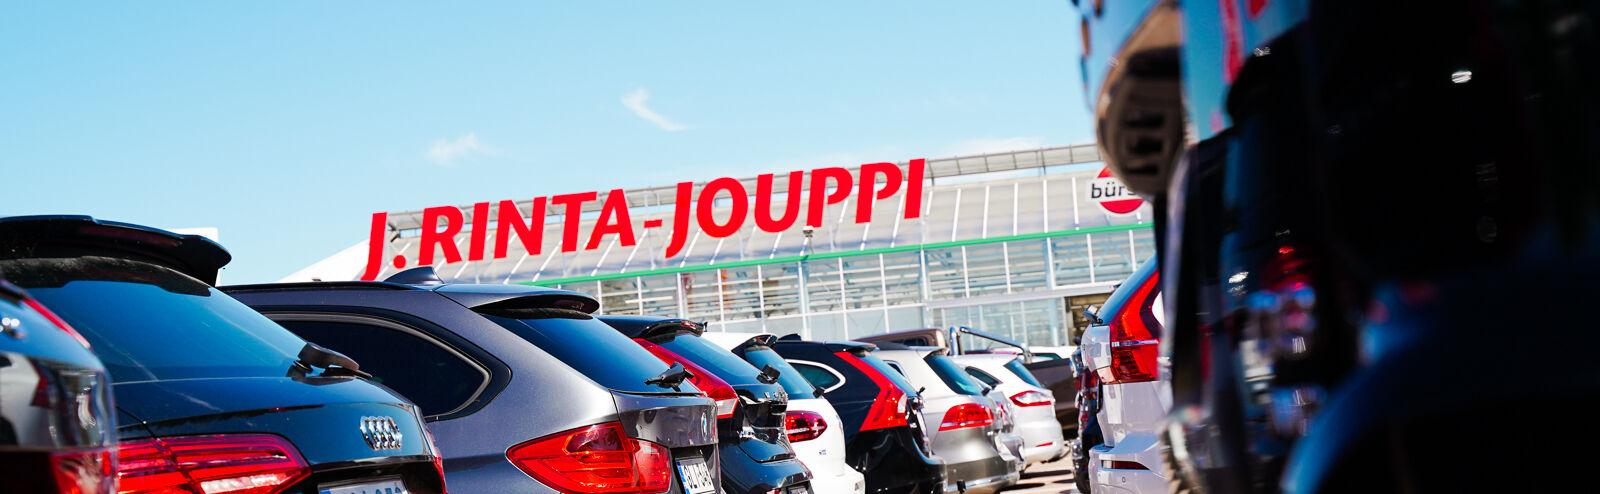 Autoliike Raisio –J. Rinta-Jouppi